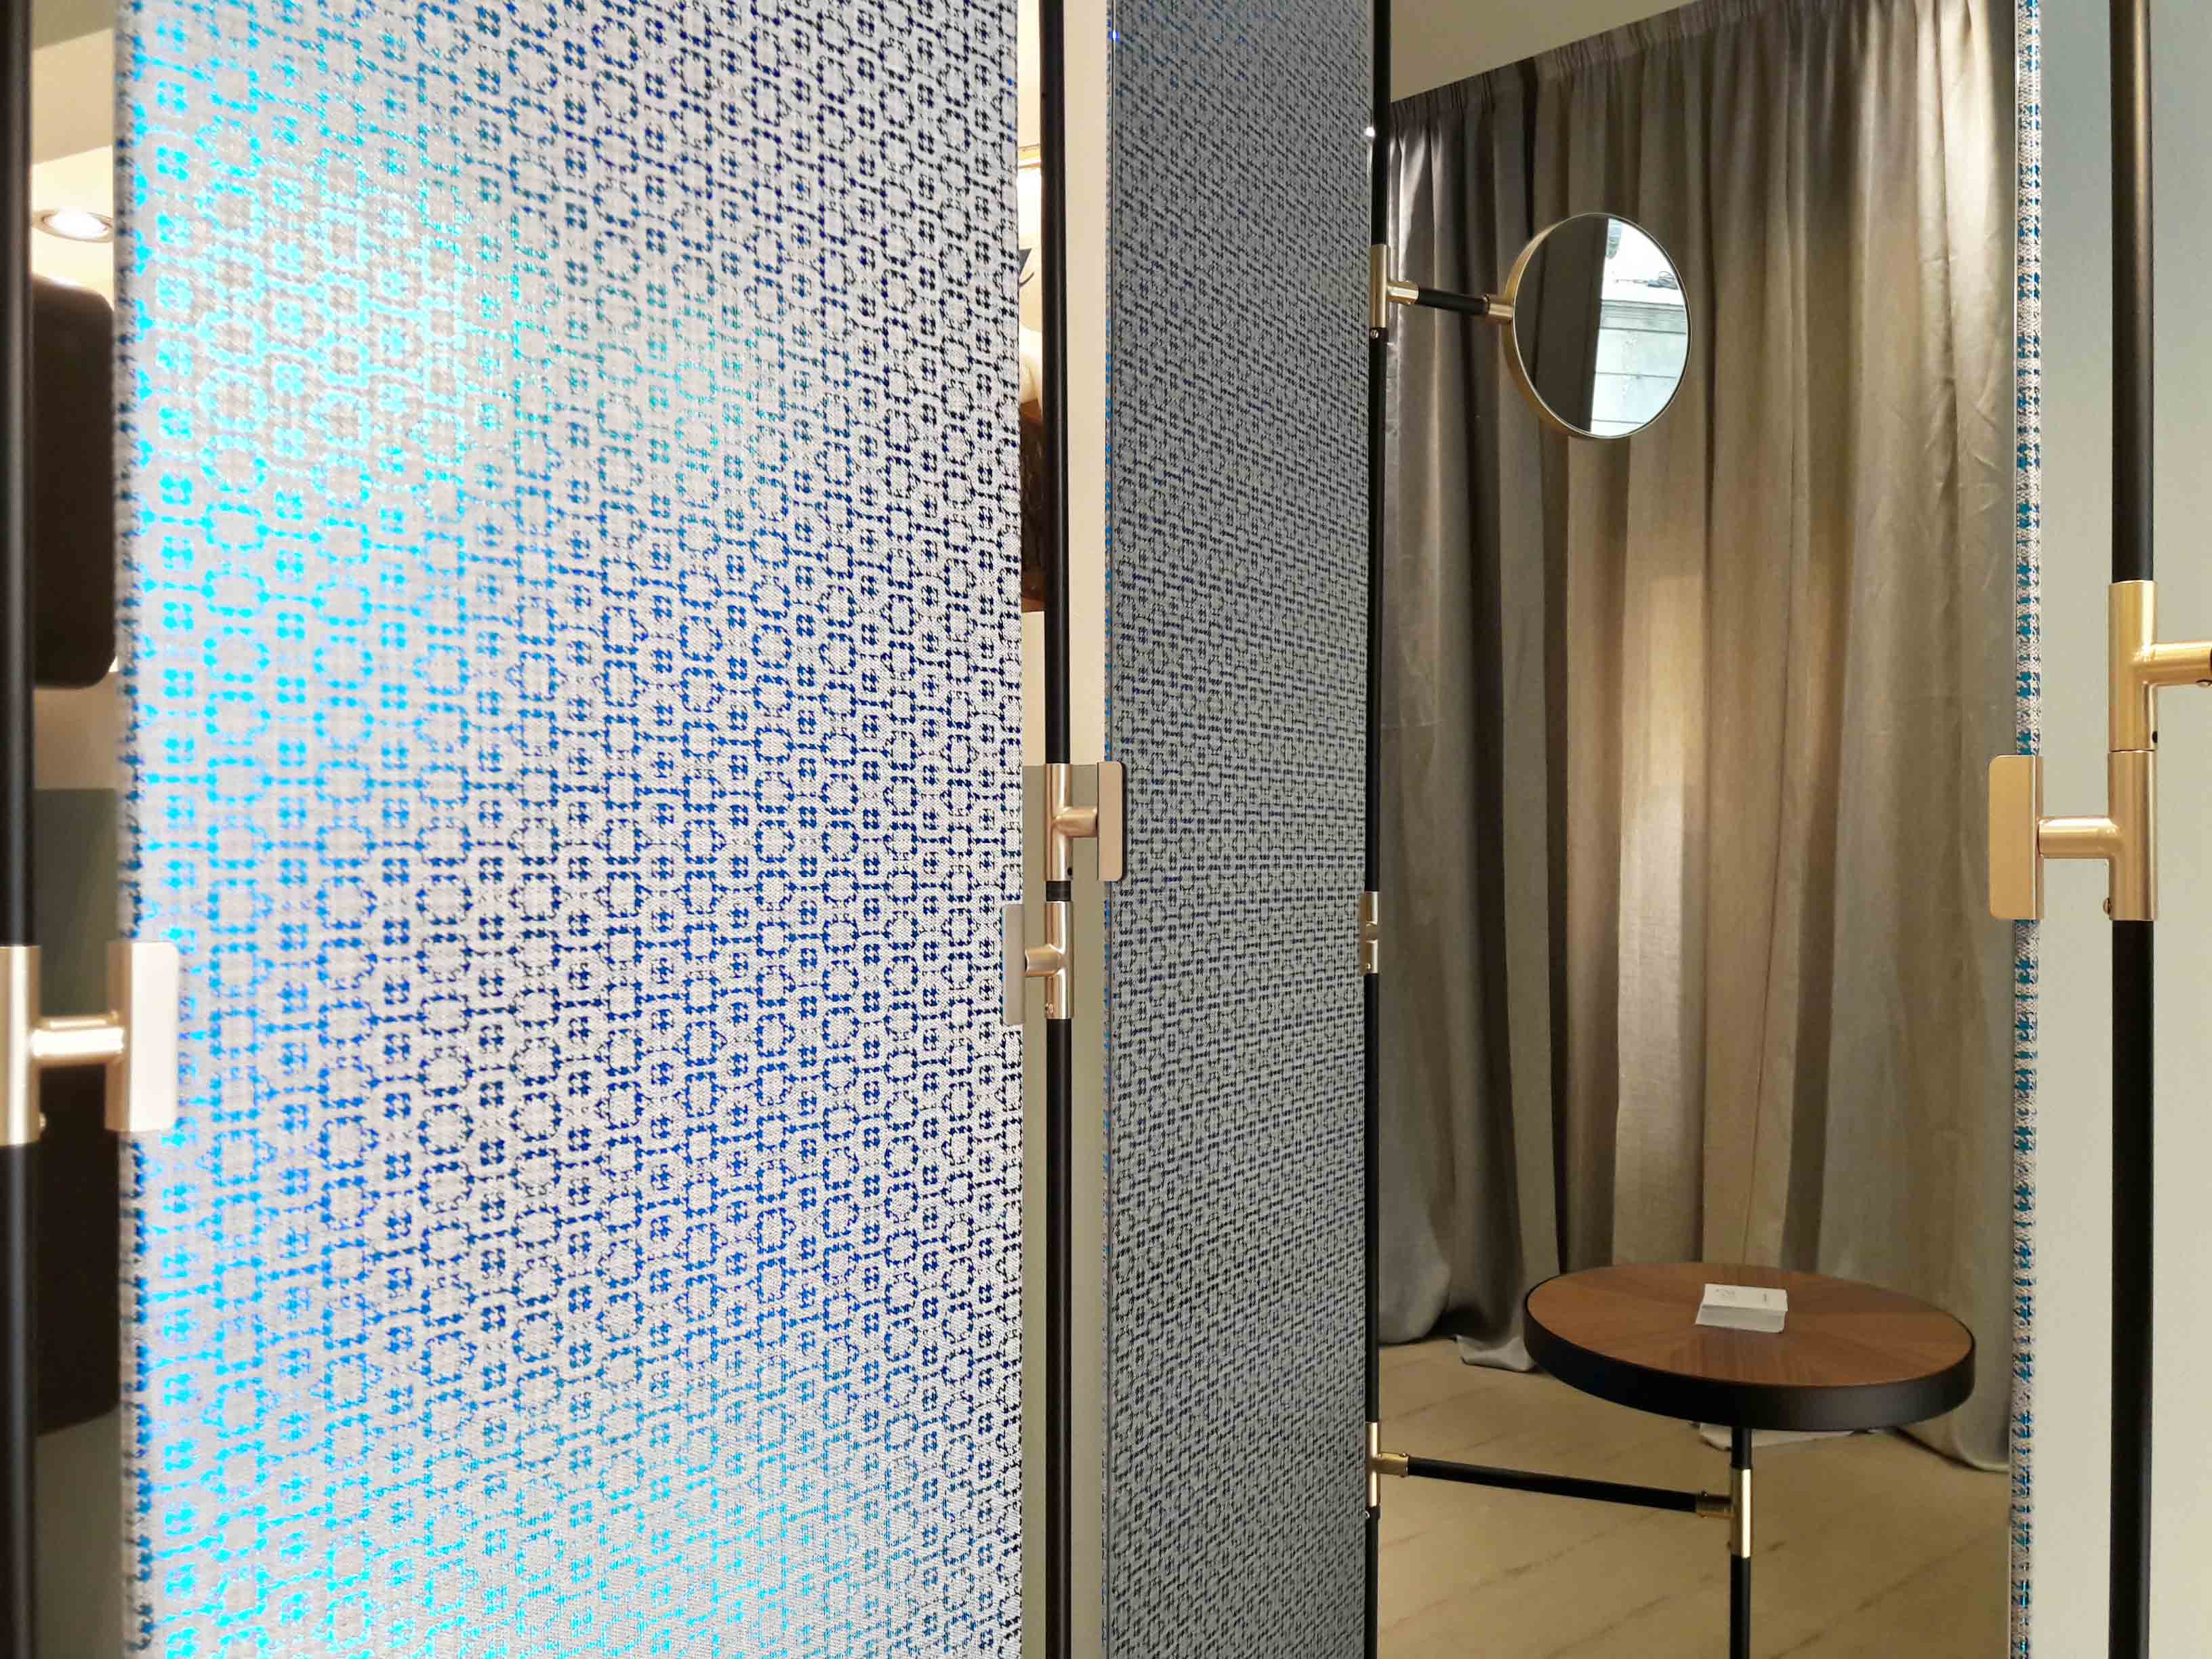 iridescent-textile-pattern-geometry-wallpaper